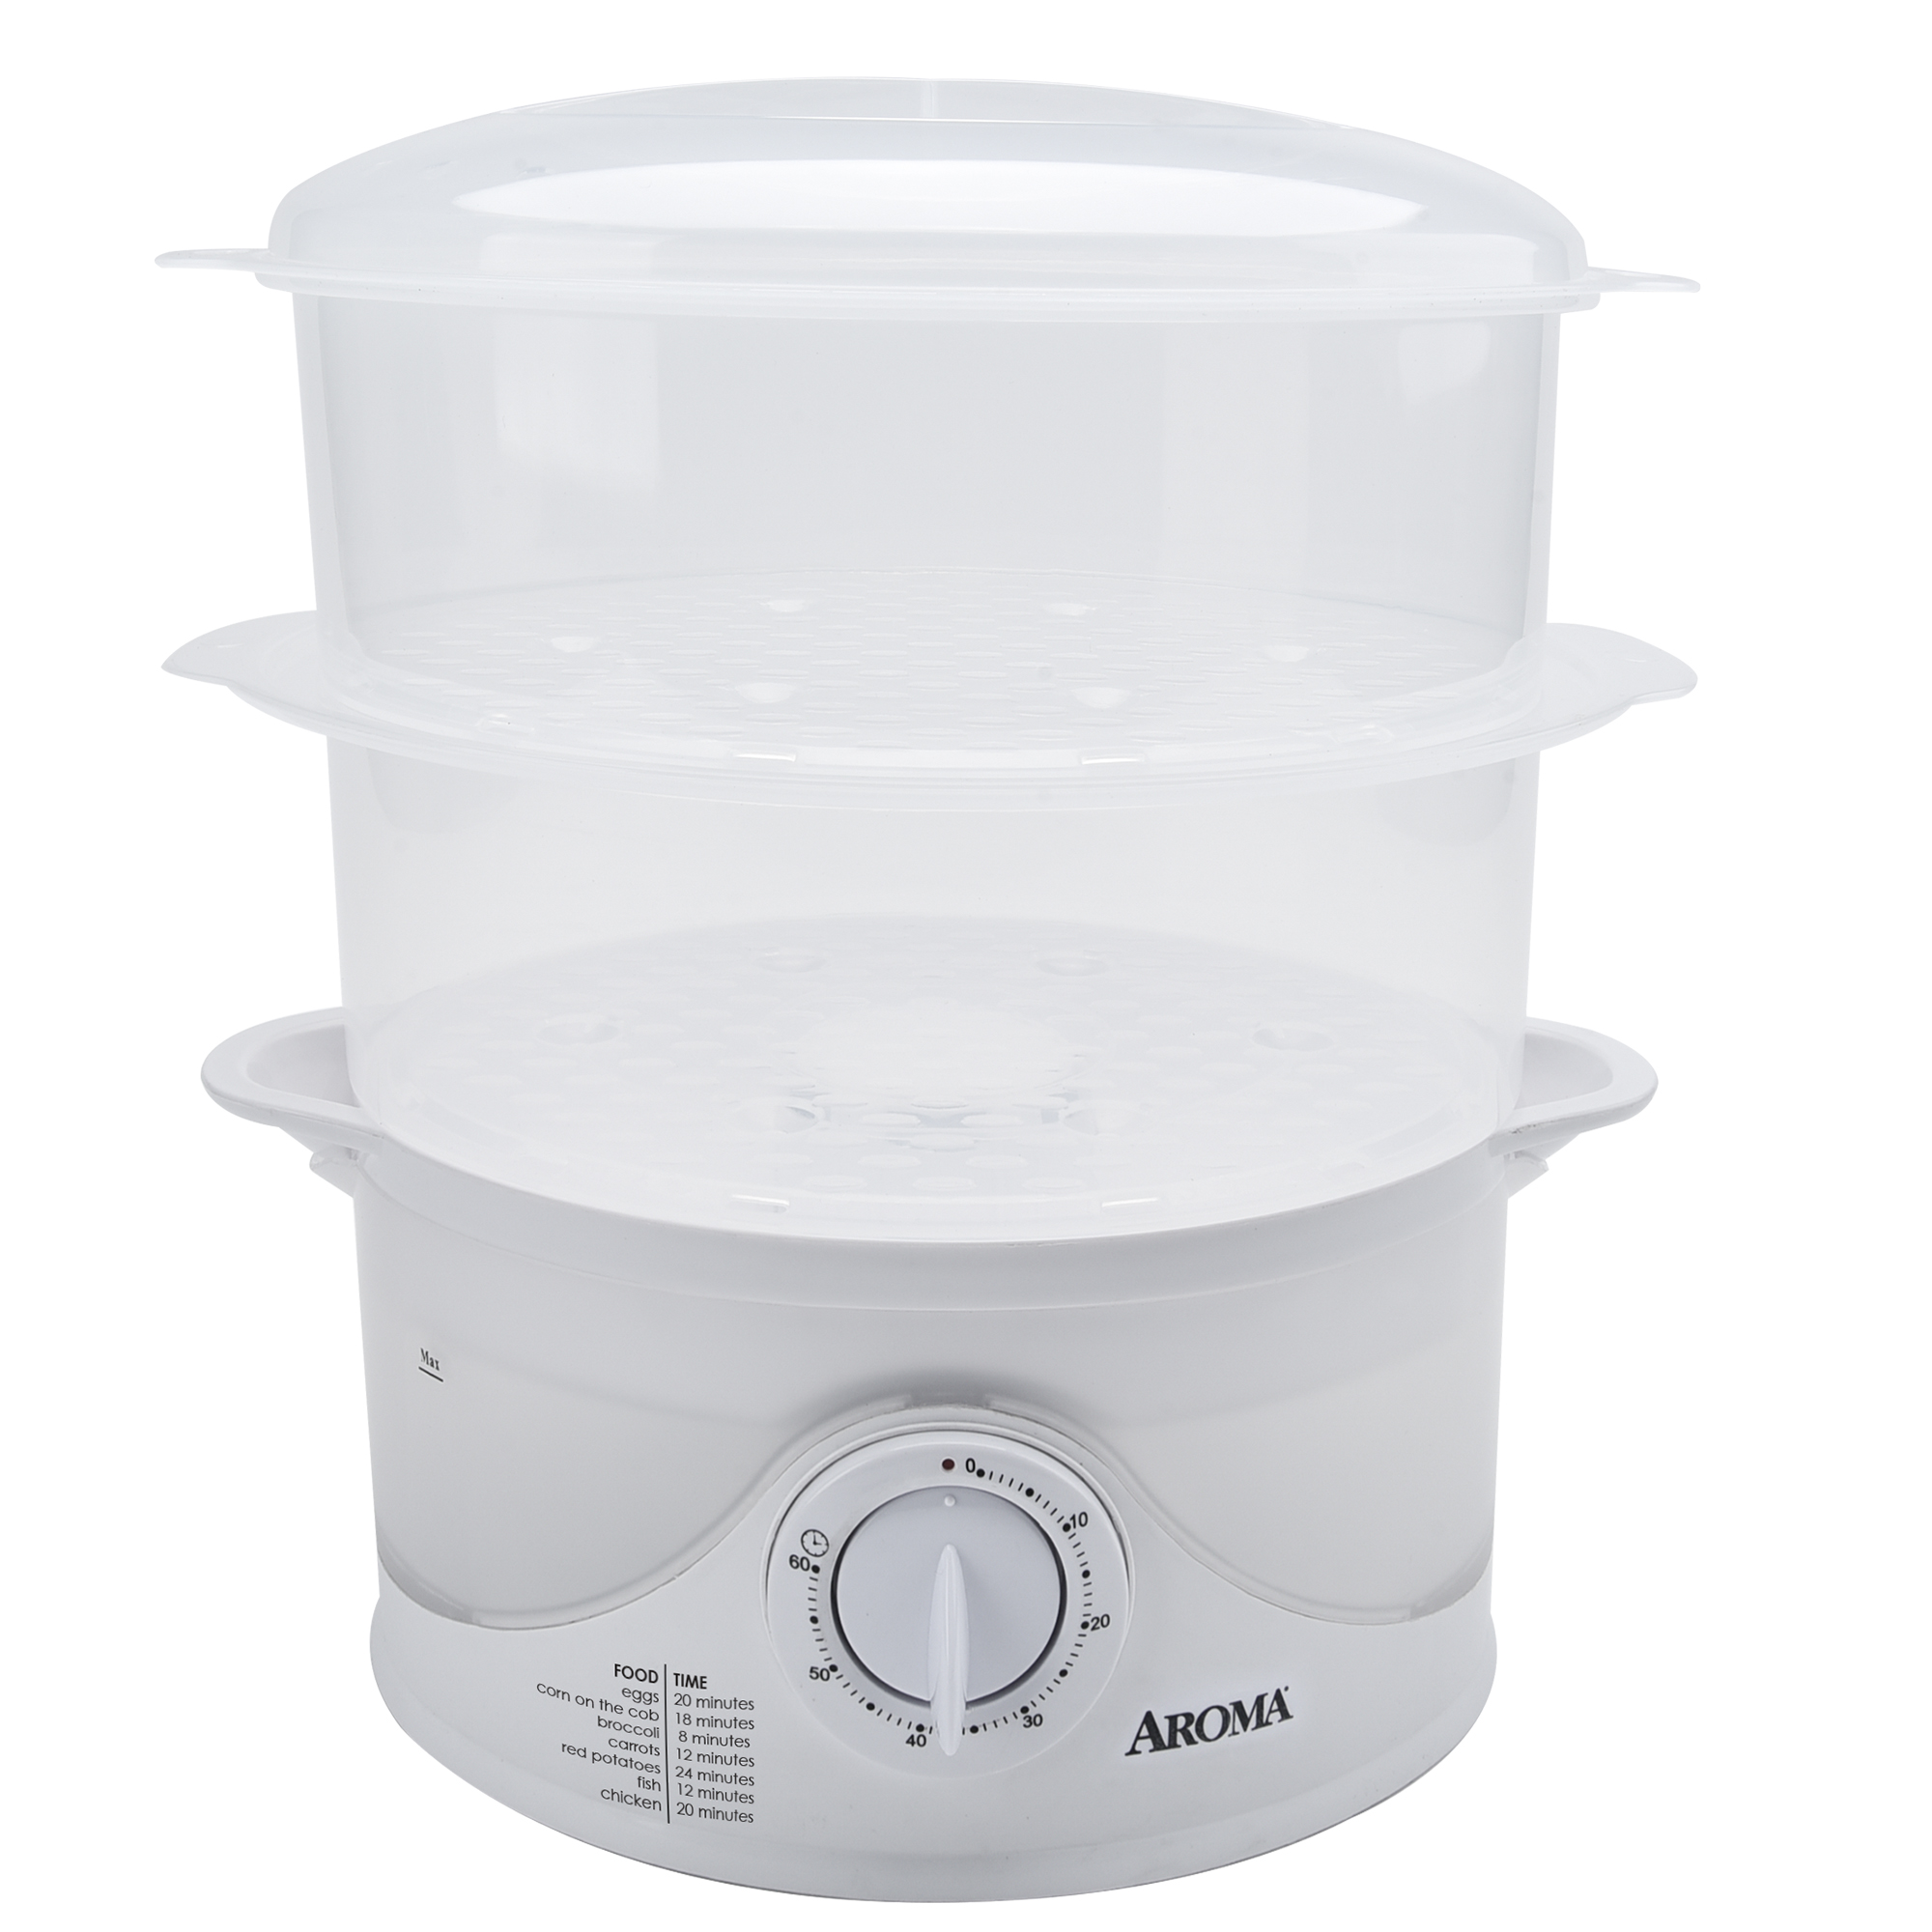 Aroma 6 Quart Dishwasher Safe Food Steamer 4 Piece Walmartcom